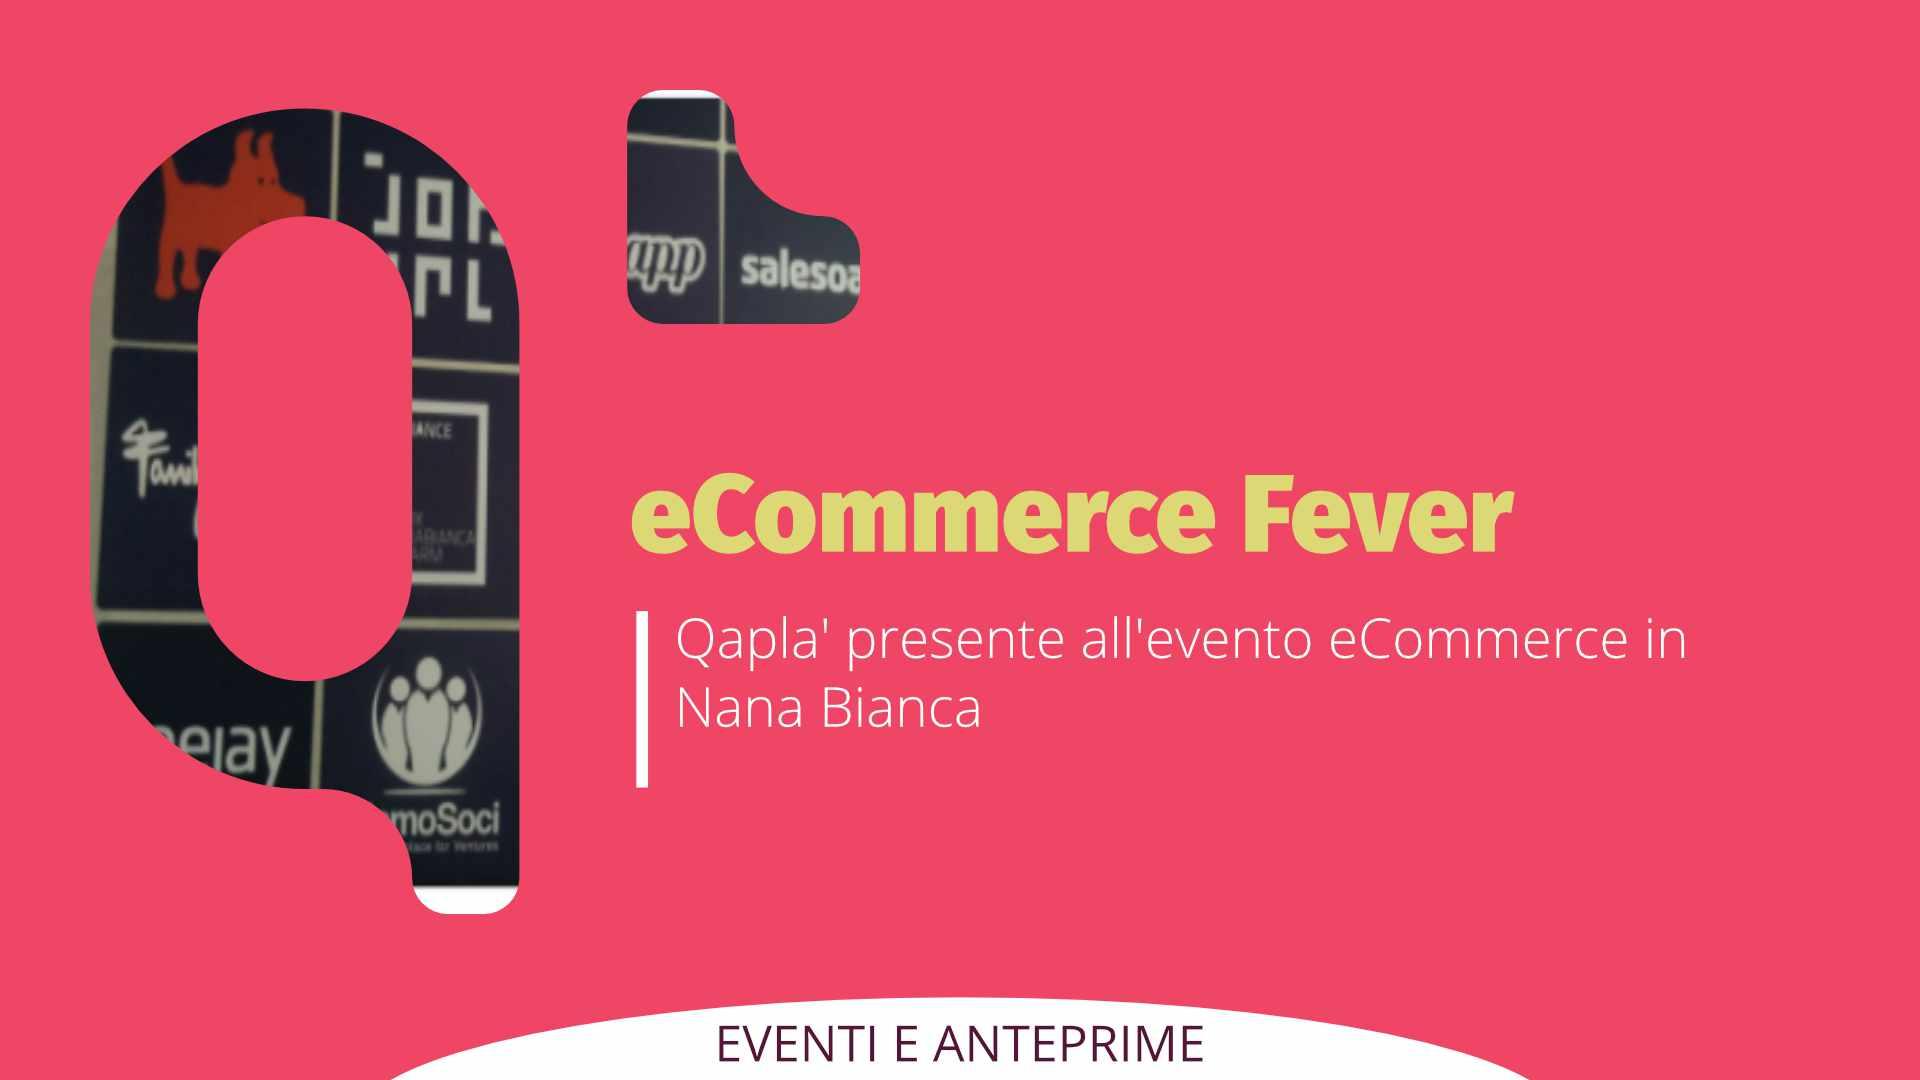 eCommerce fever